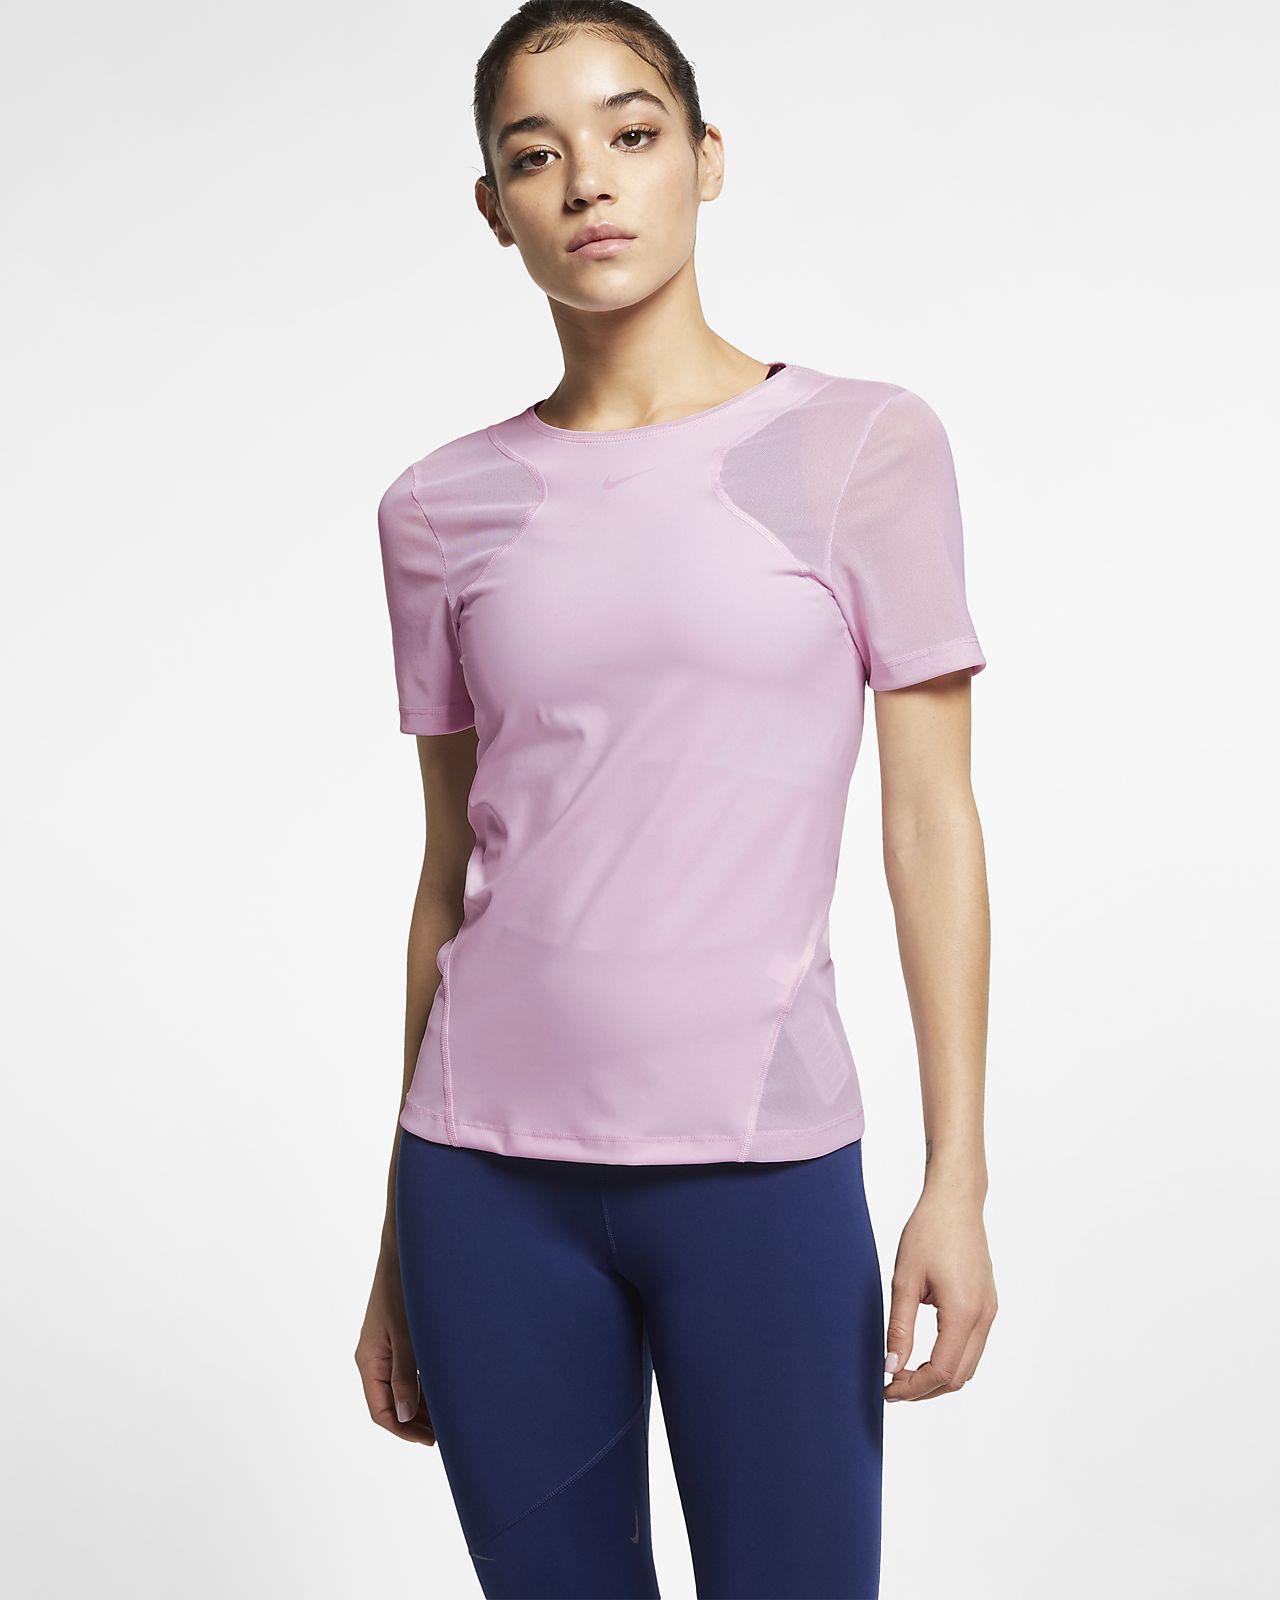 82ec83e8c4763 Nike Pro HyperCool Women s Short-Sleeve Top. Nike.com BE